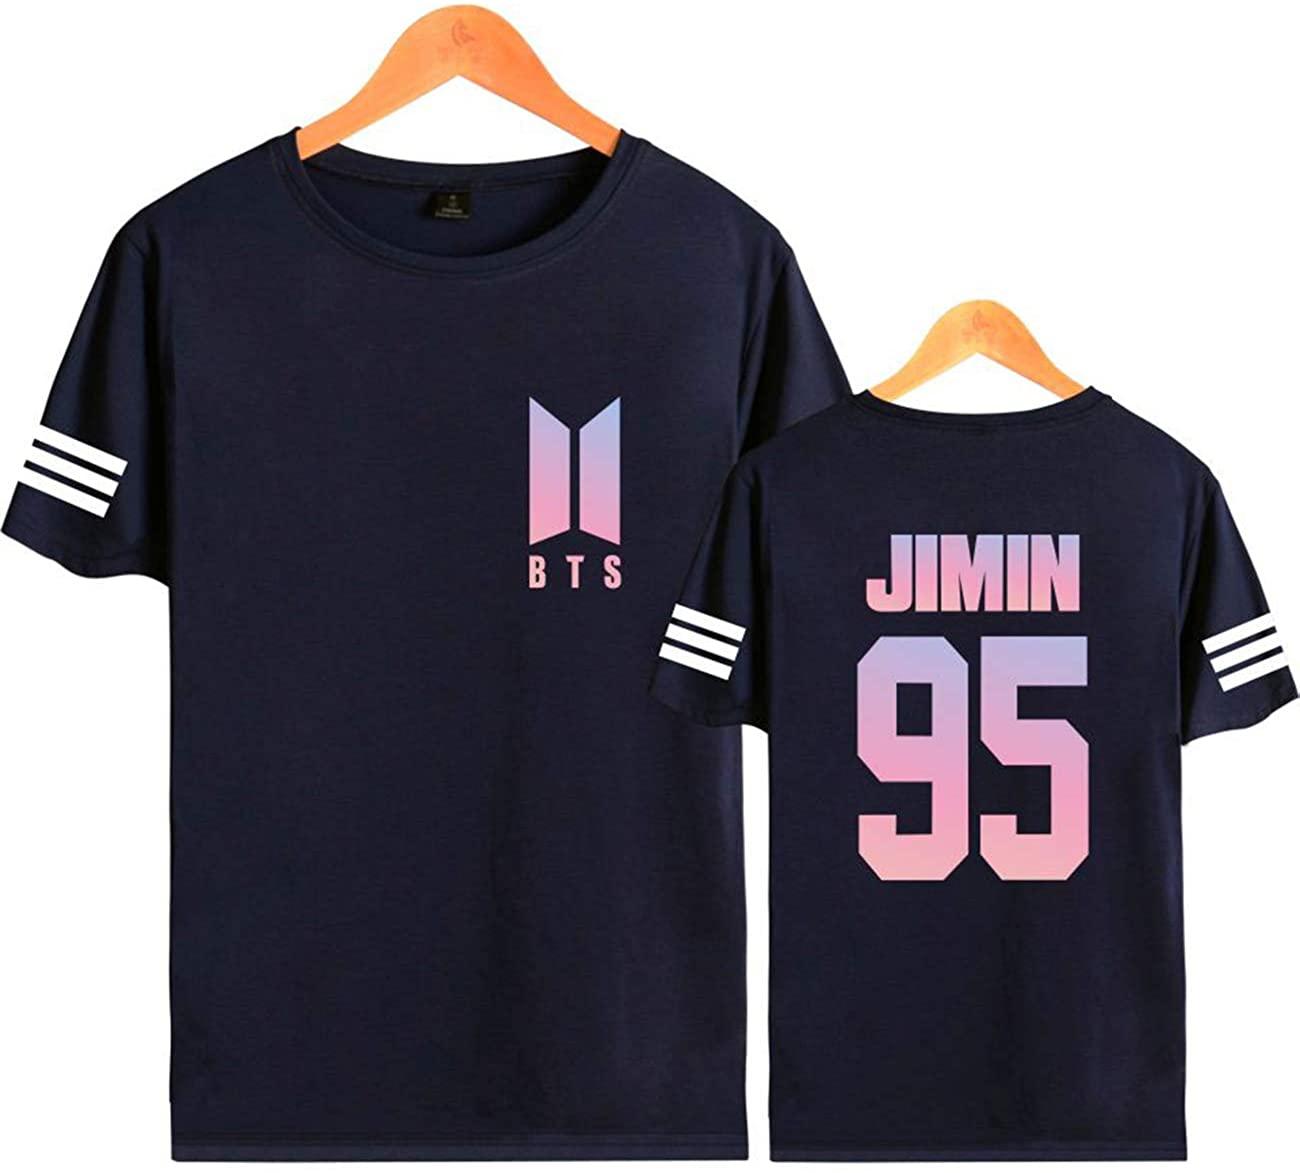 ZIGJOY Kpop Korean Boys Group Short-Sleeved Shirt Sweater Suga V Jin Jimin Jung Kook for Fans